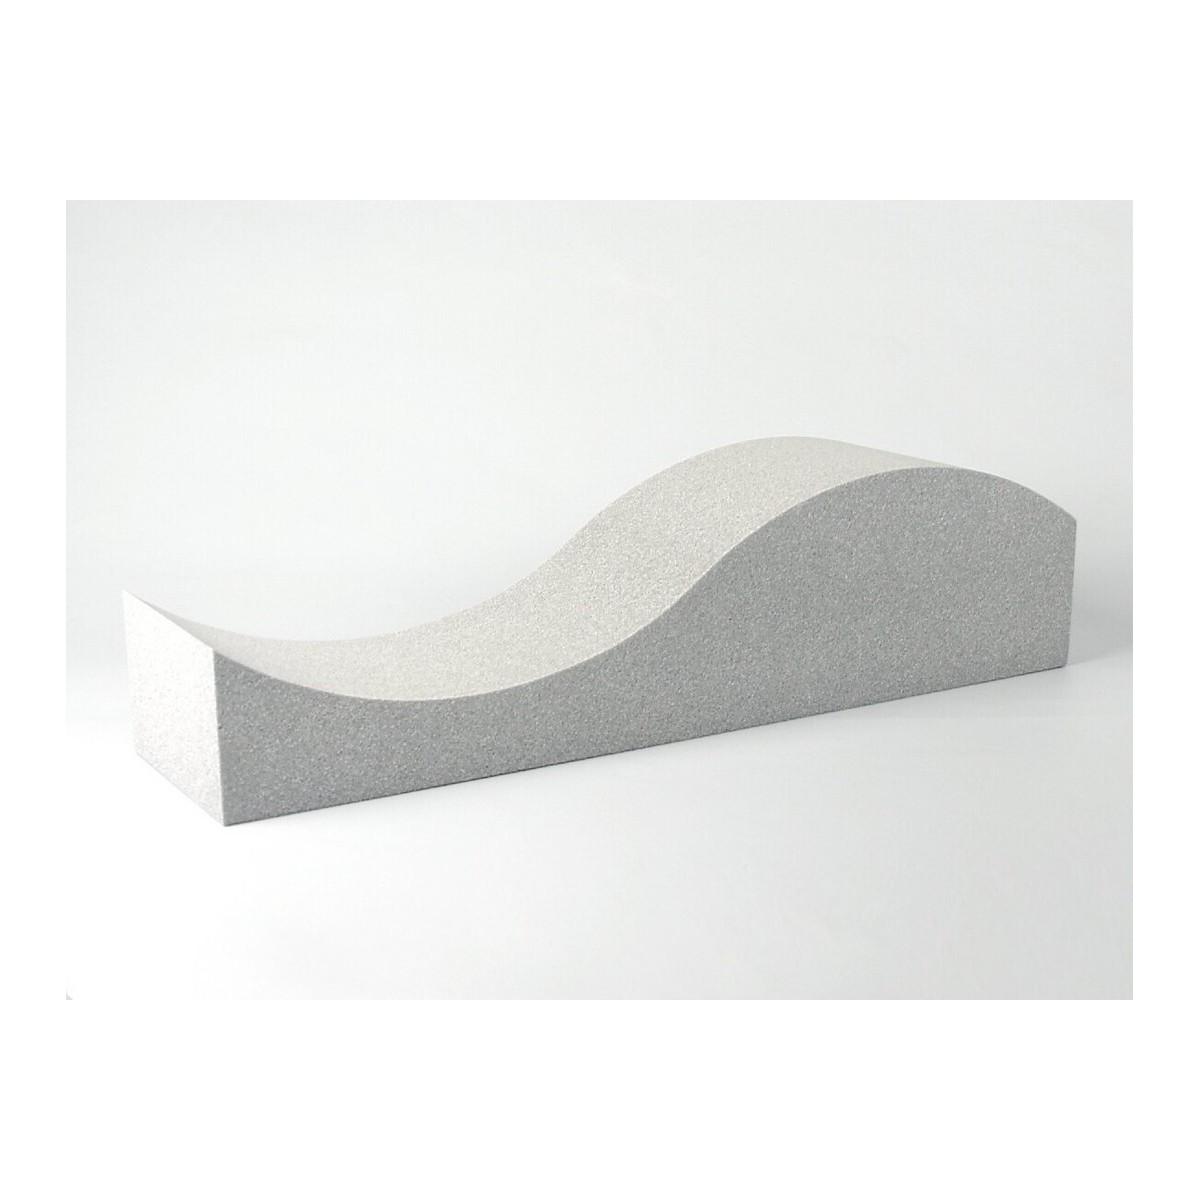 EliAcoustic Surf Pure White